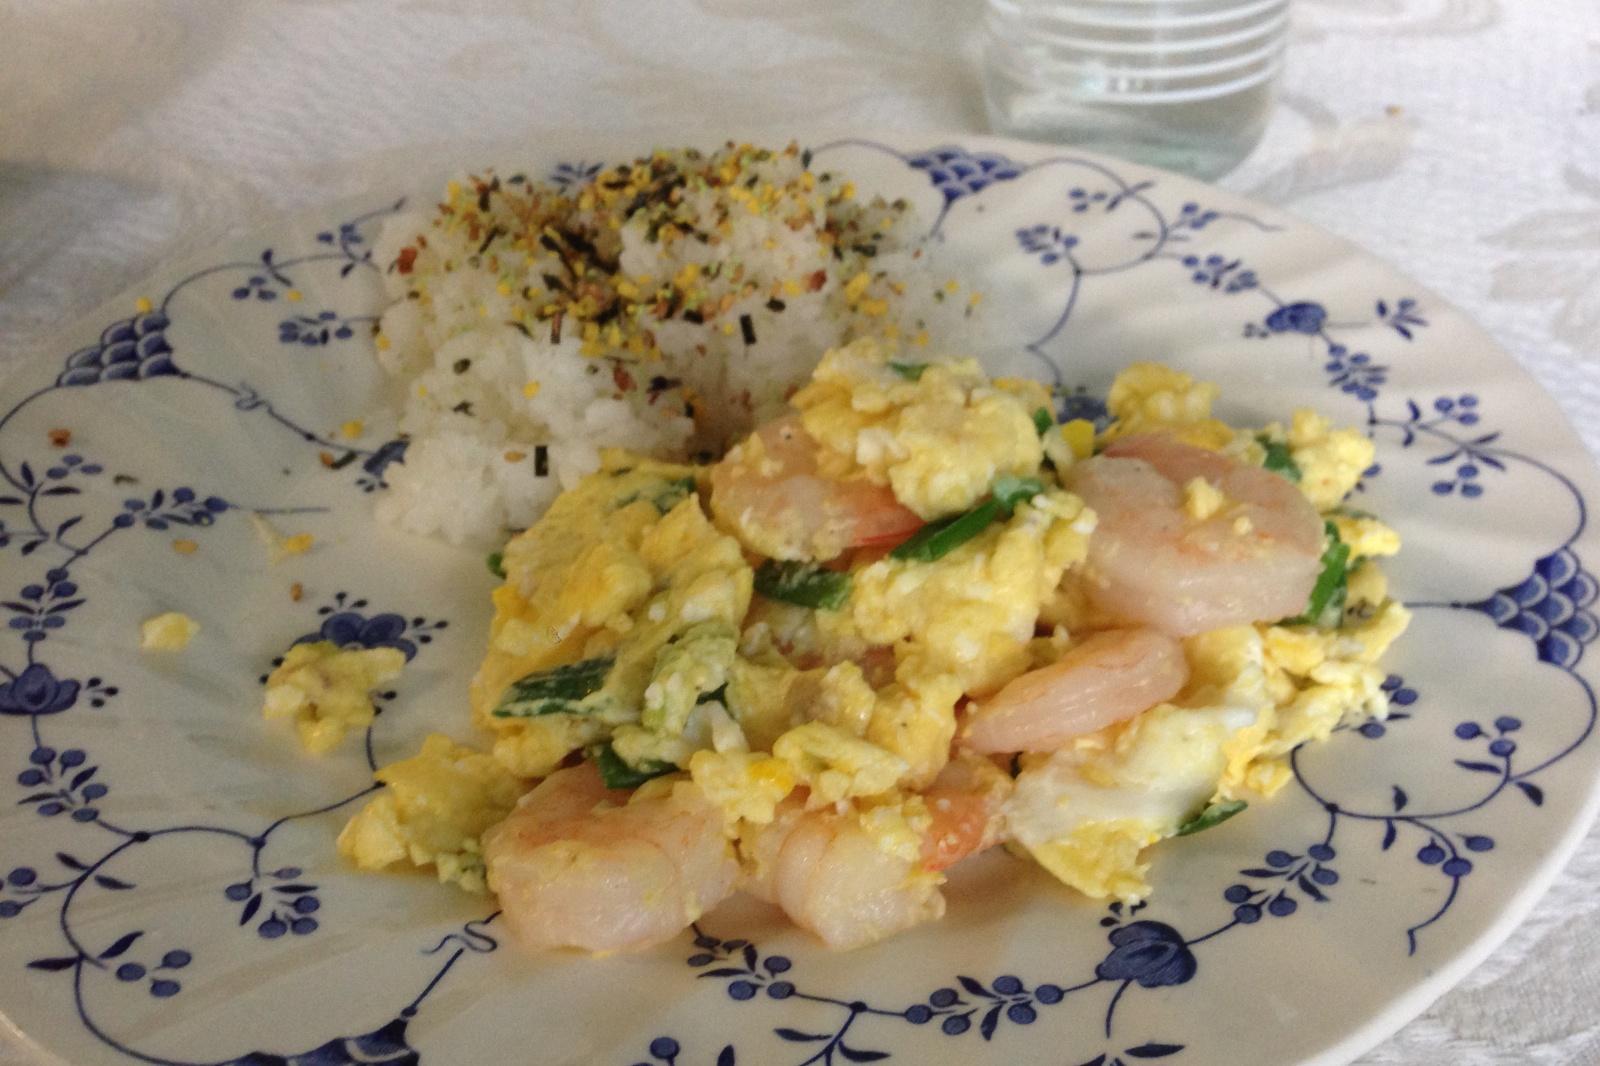 http://blog.rickk.com/food/2014/08/28/ate.2014.08.28.l.jpg